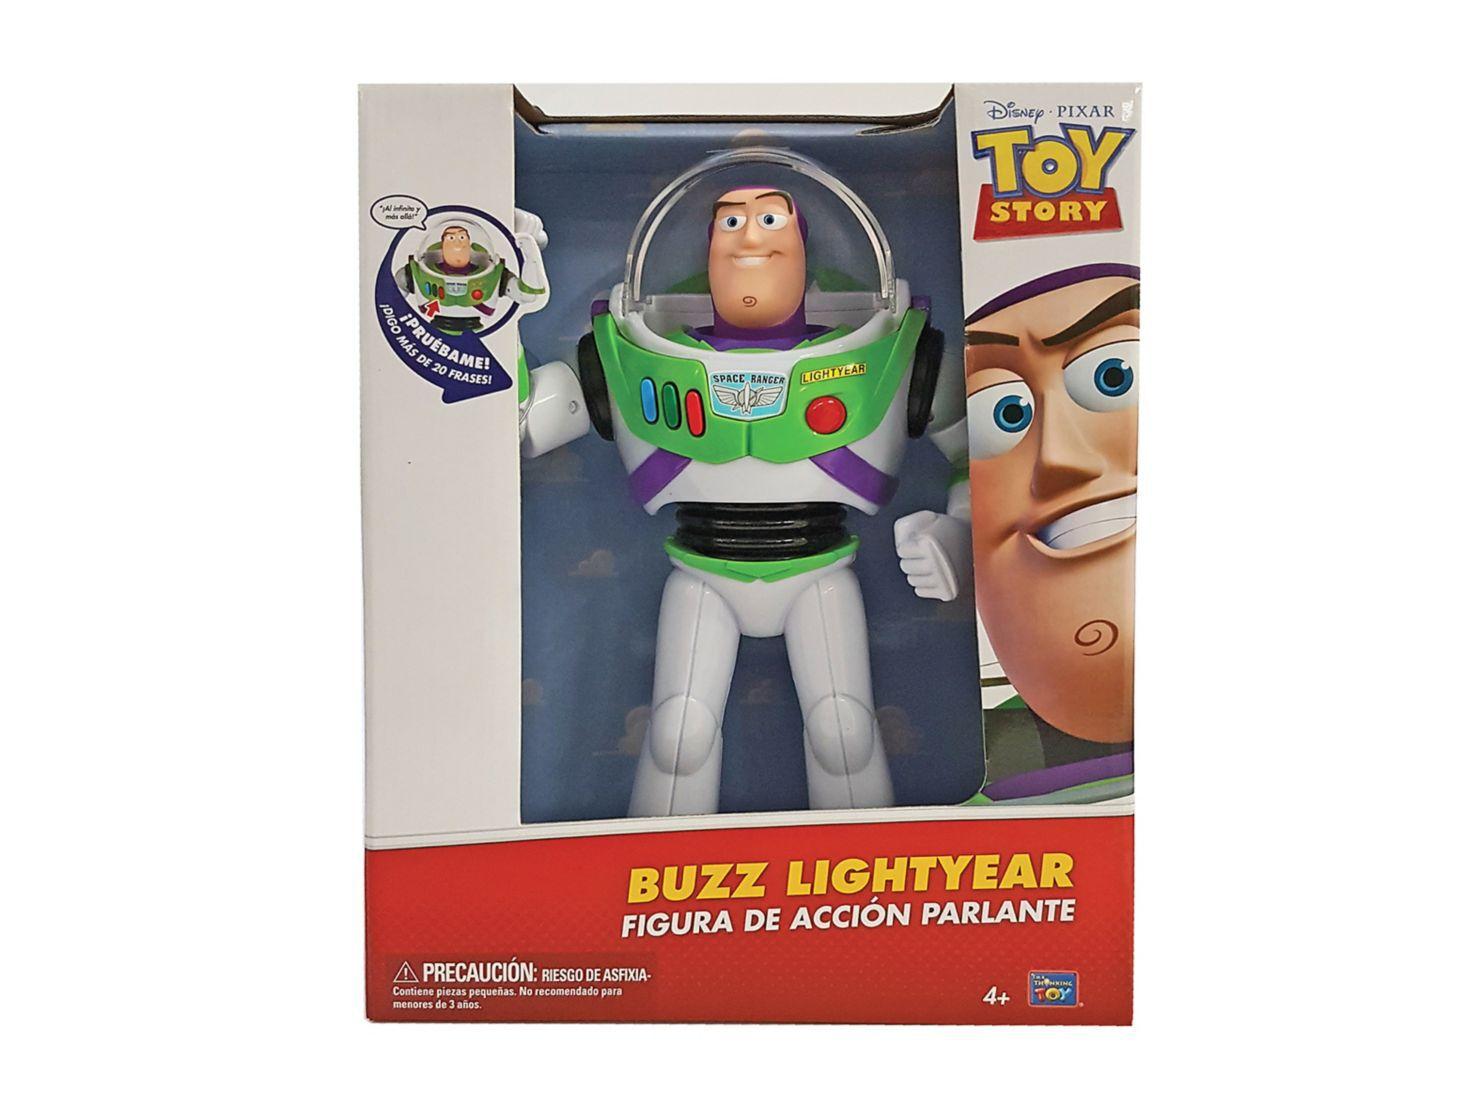 ... Buzz%20Lightyear%20con%20Sonido%20Toy%20Story%2C%2Chi- 1c22fcac35b